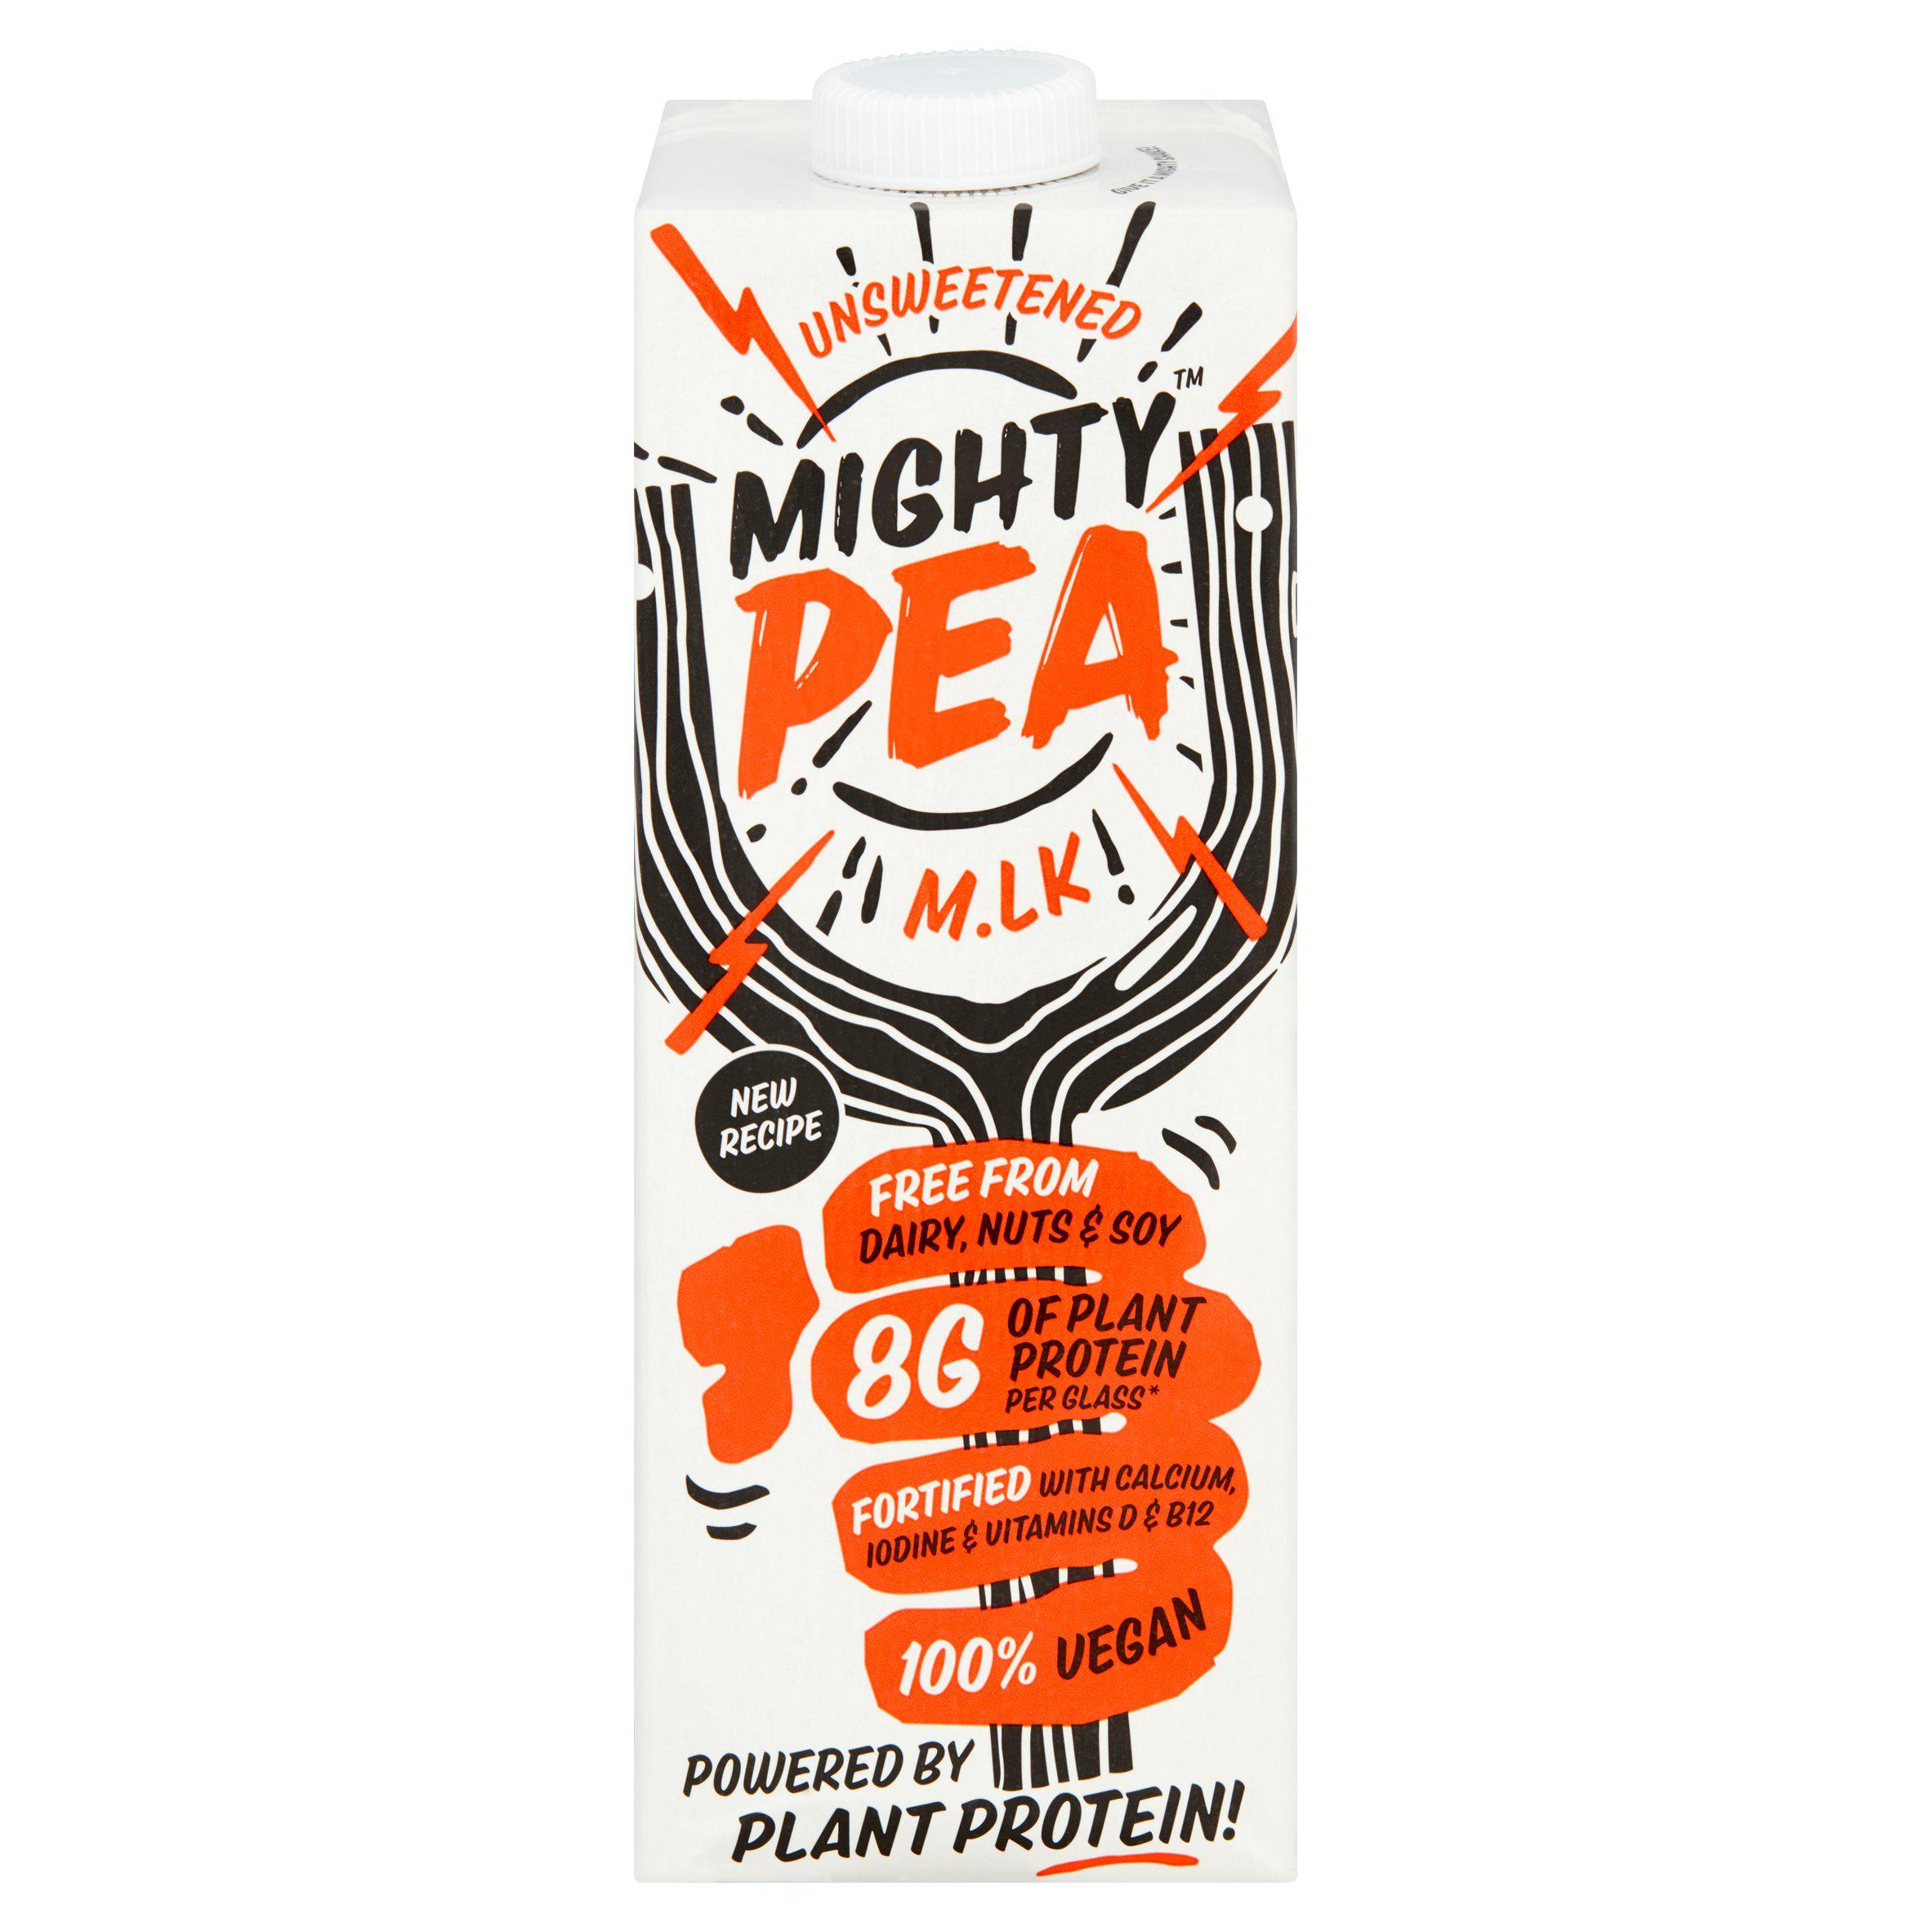 Mighty Pea Vegan Plant Milk Alternative 1 Litre £1.25 @ Sainsbury's